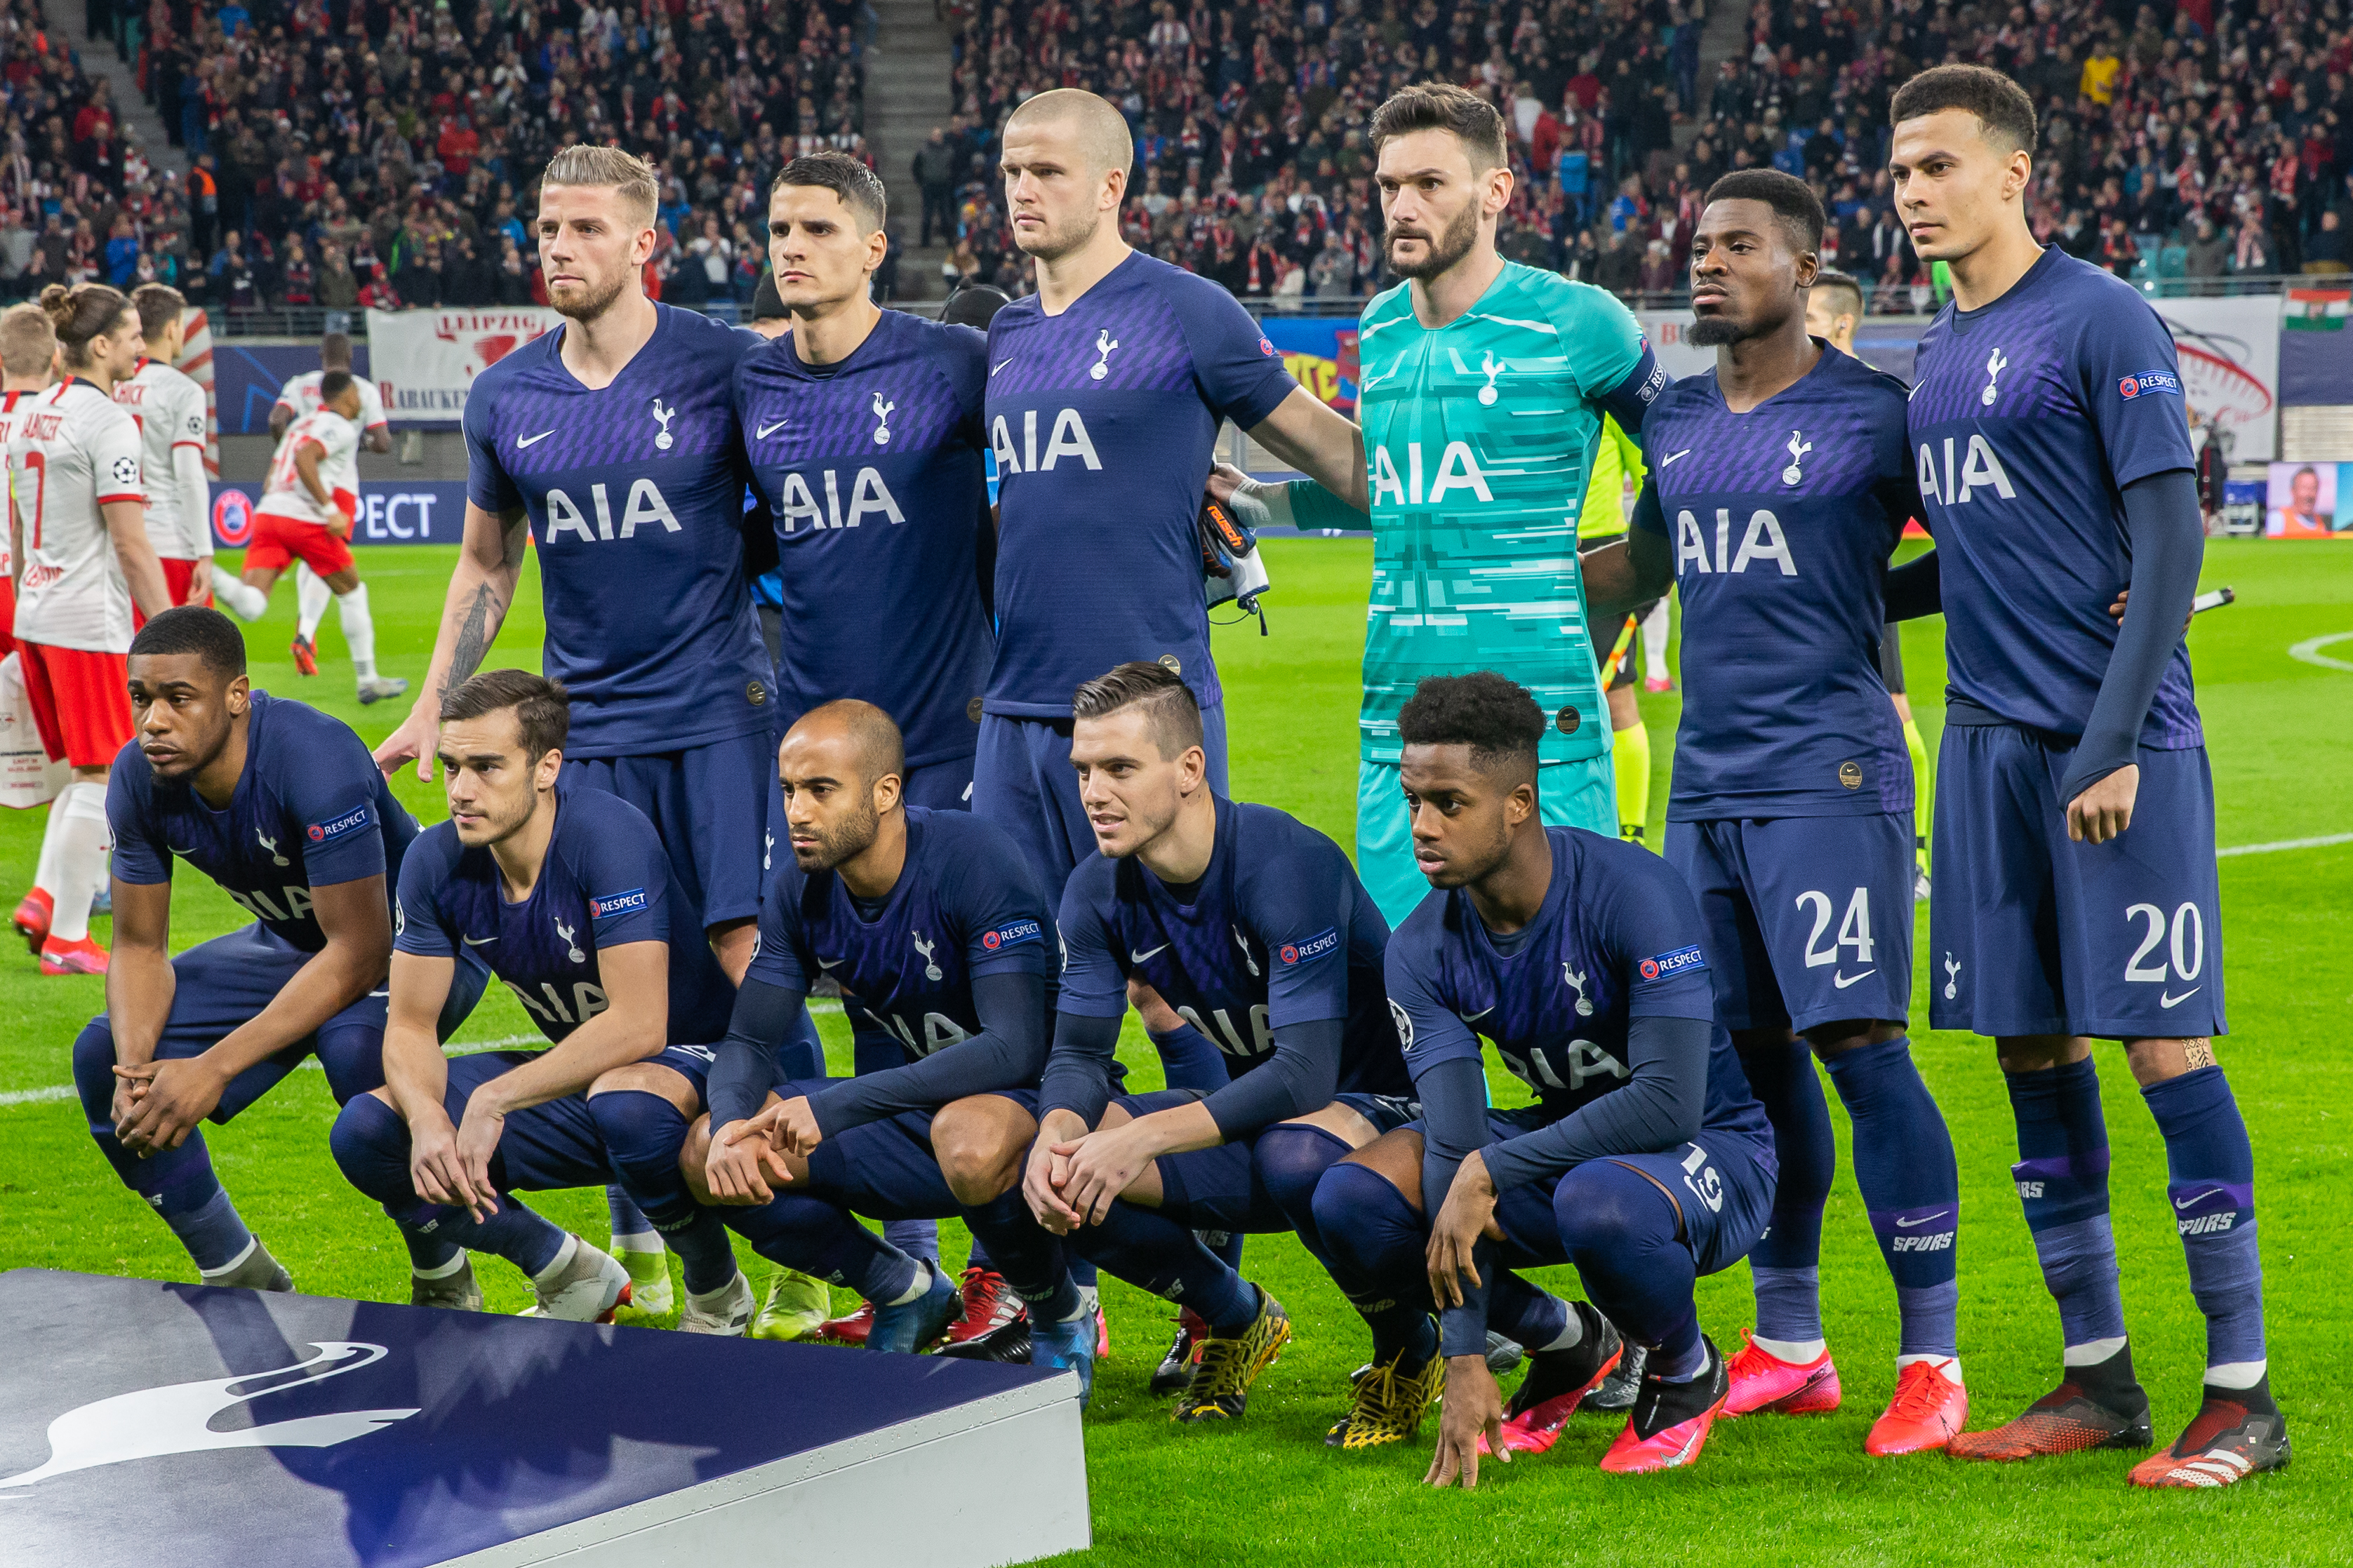 Tottenham Hotspur Football Club 2019-2020 - Wikipedia